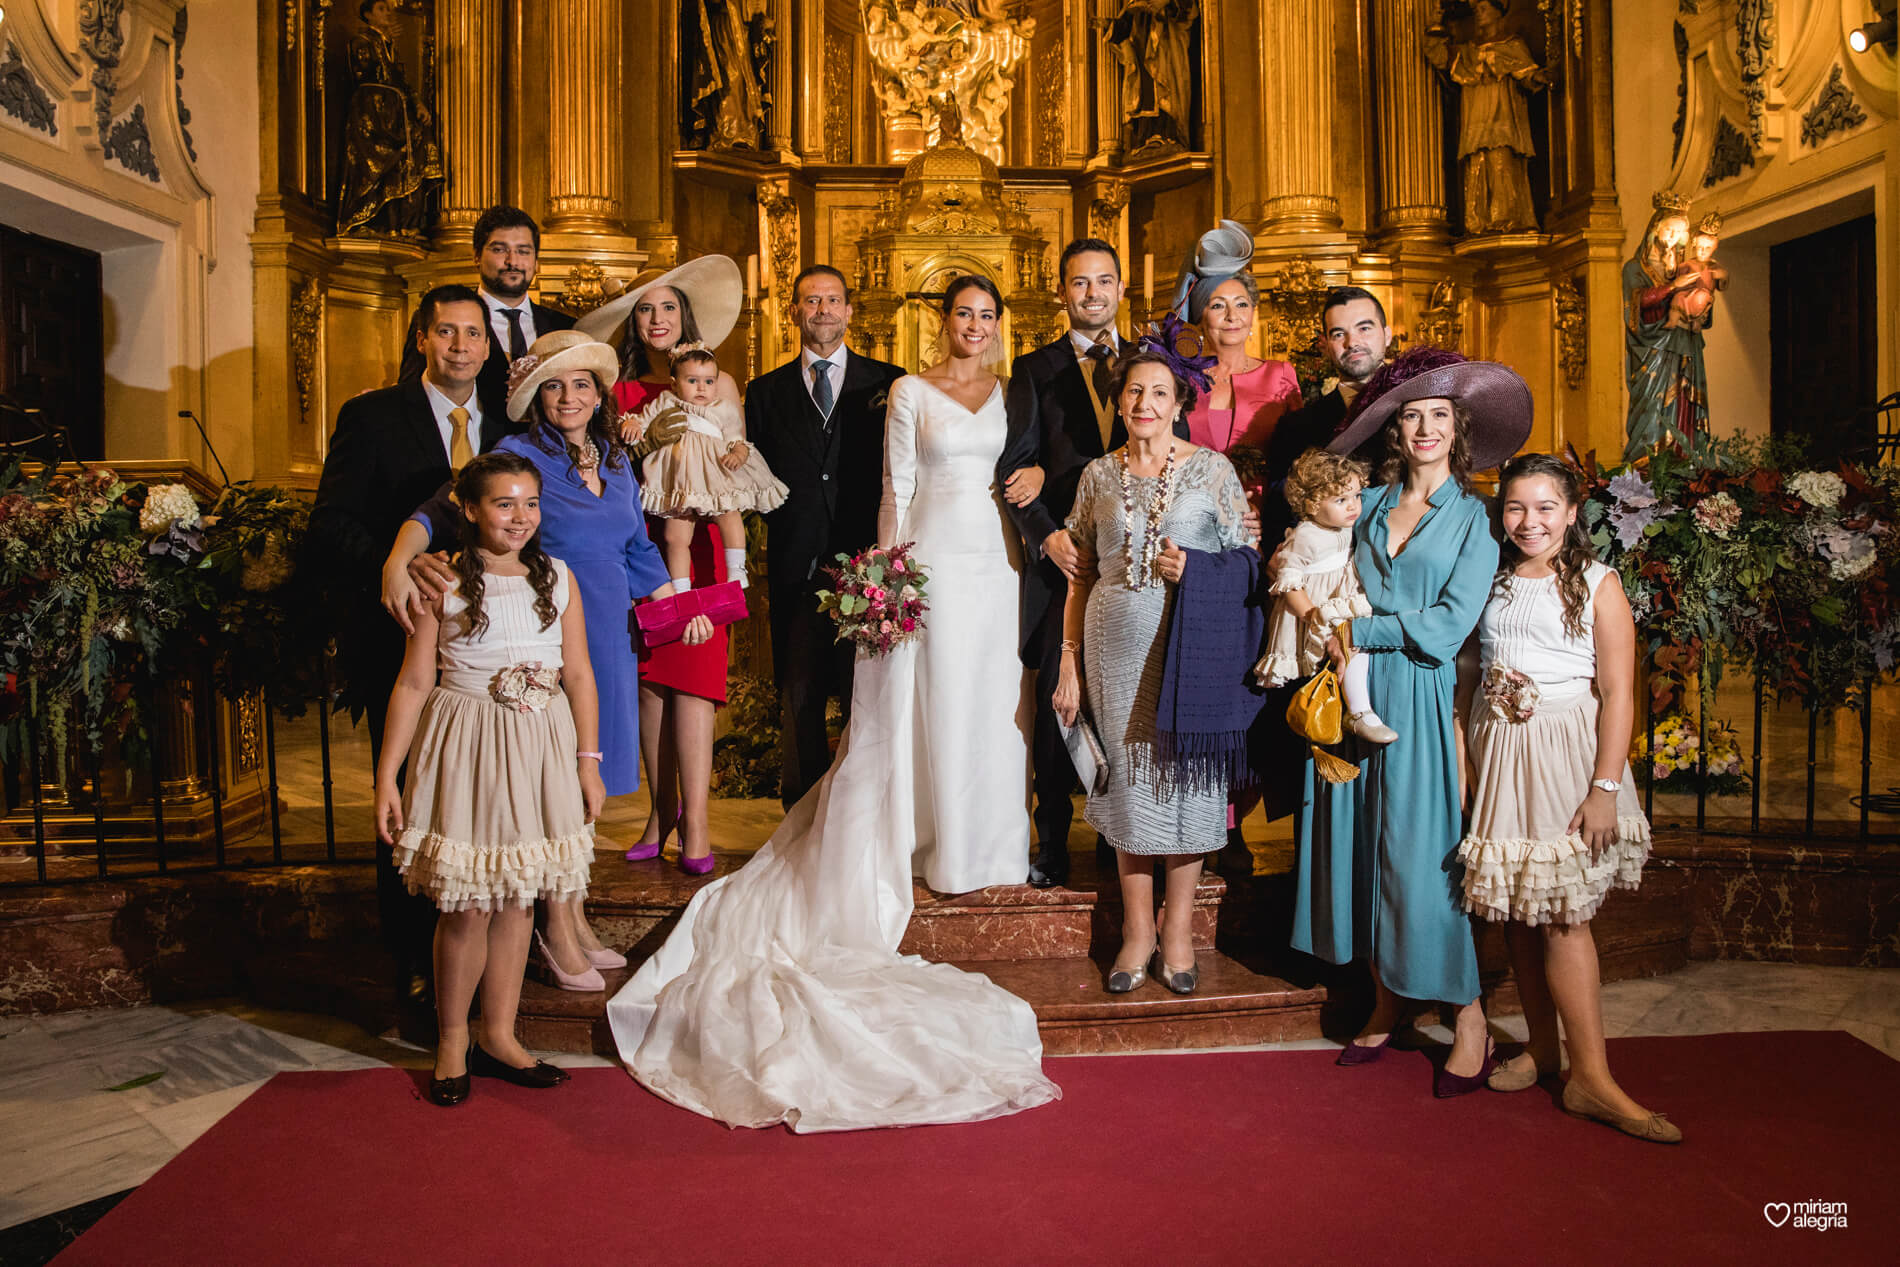 vestido-de-novia-paula-del-vas-miriam-alegria-fotografos-boda-murcia-73